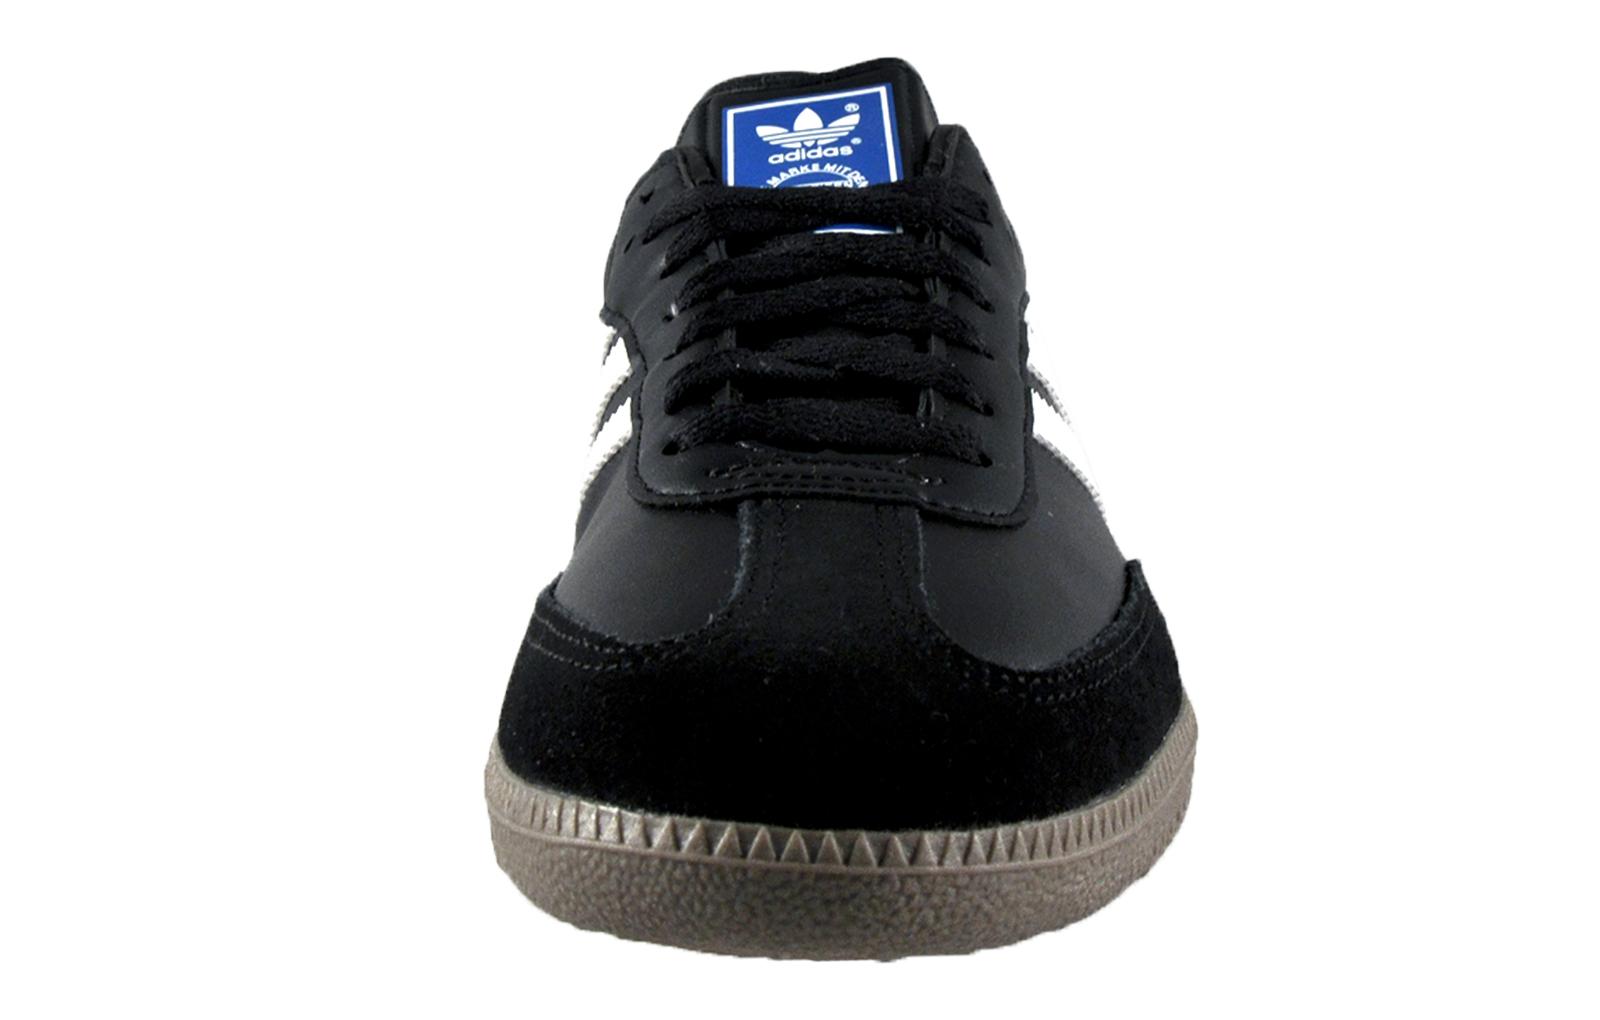 adidas originals mens samba classic leather retro trainers. Black Bedroom Furniture Sets. Home Design Ideas